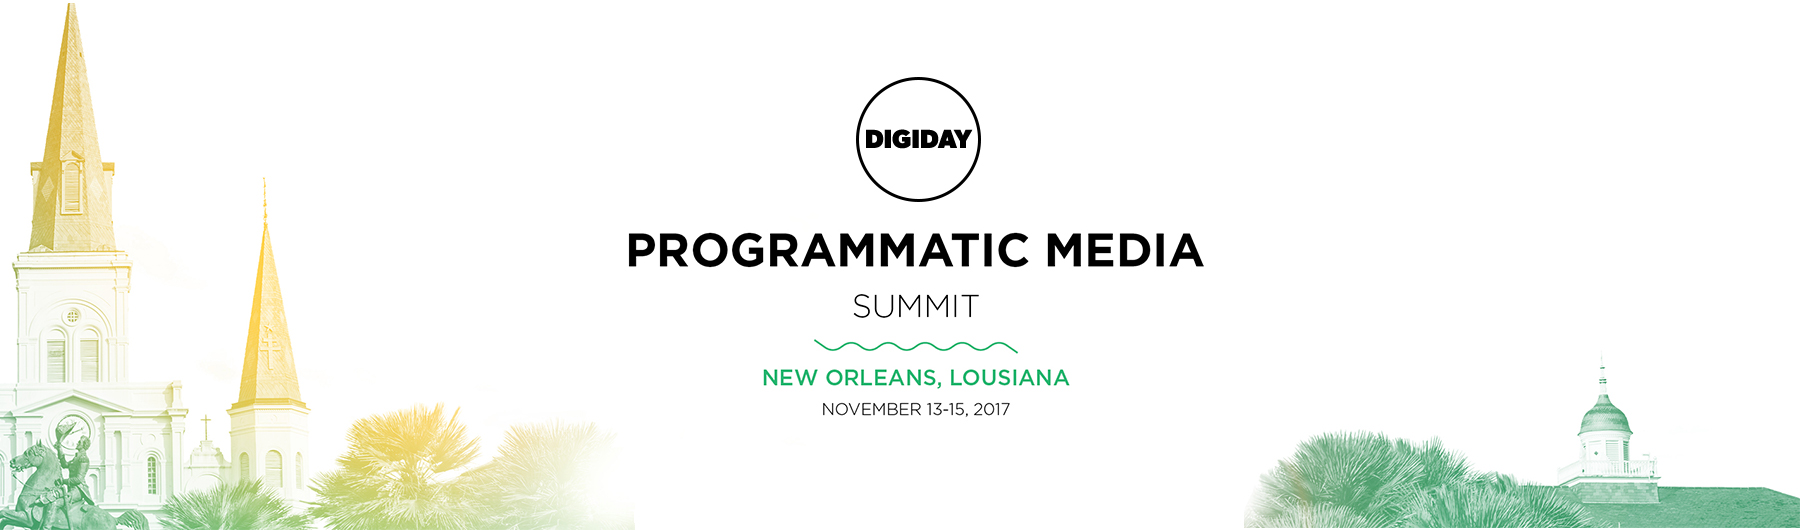 Digiday Programmatic Media Summit November 2017